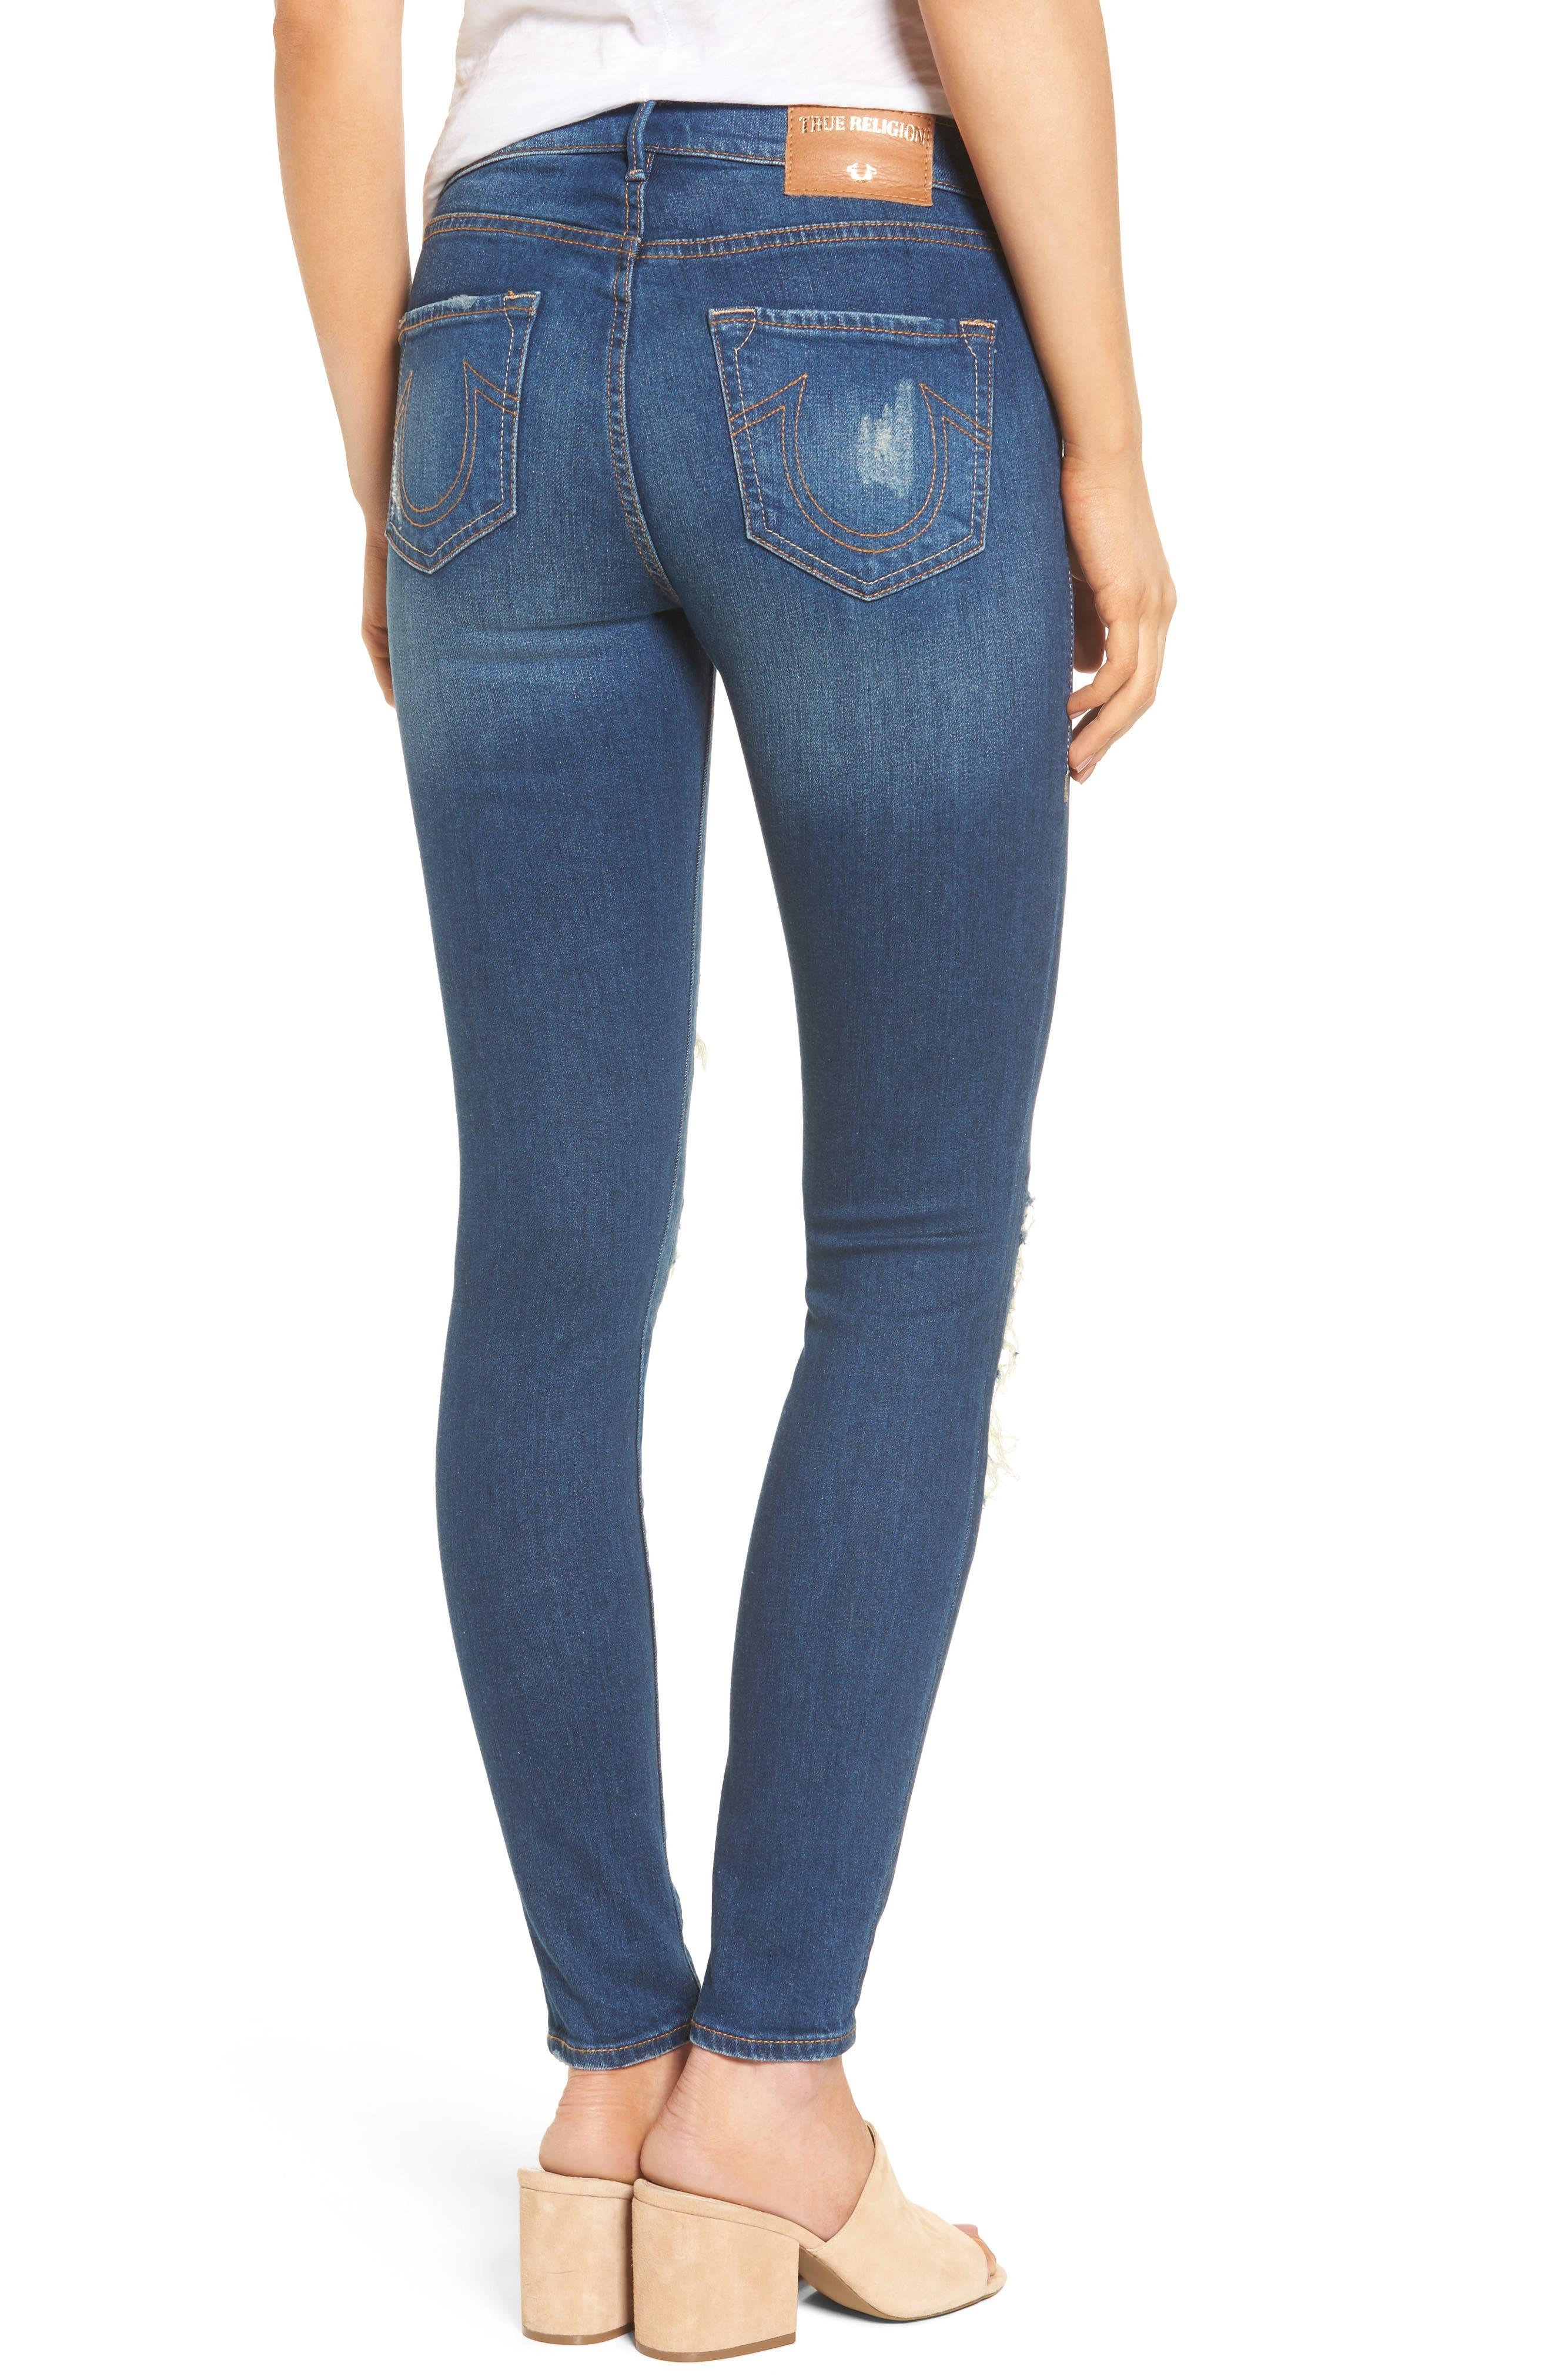 Alternate Image 2  - True Religion Brand Jeans Halle Super Skinny Jeans (Indigo Cadence)